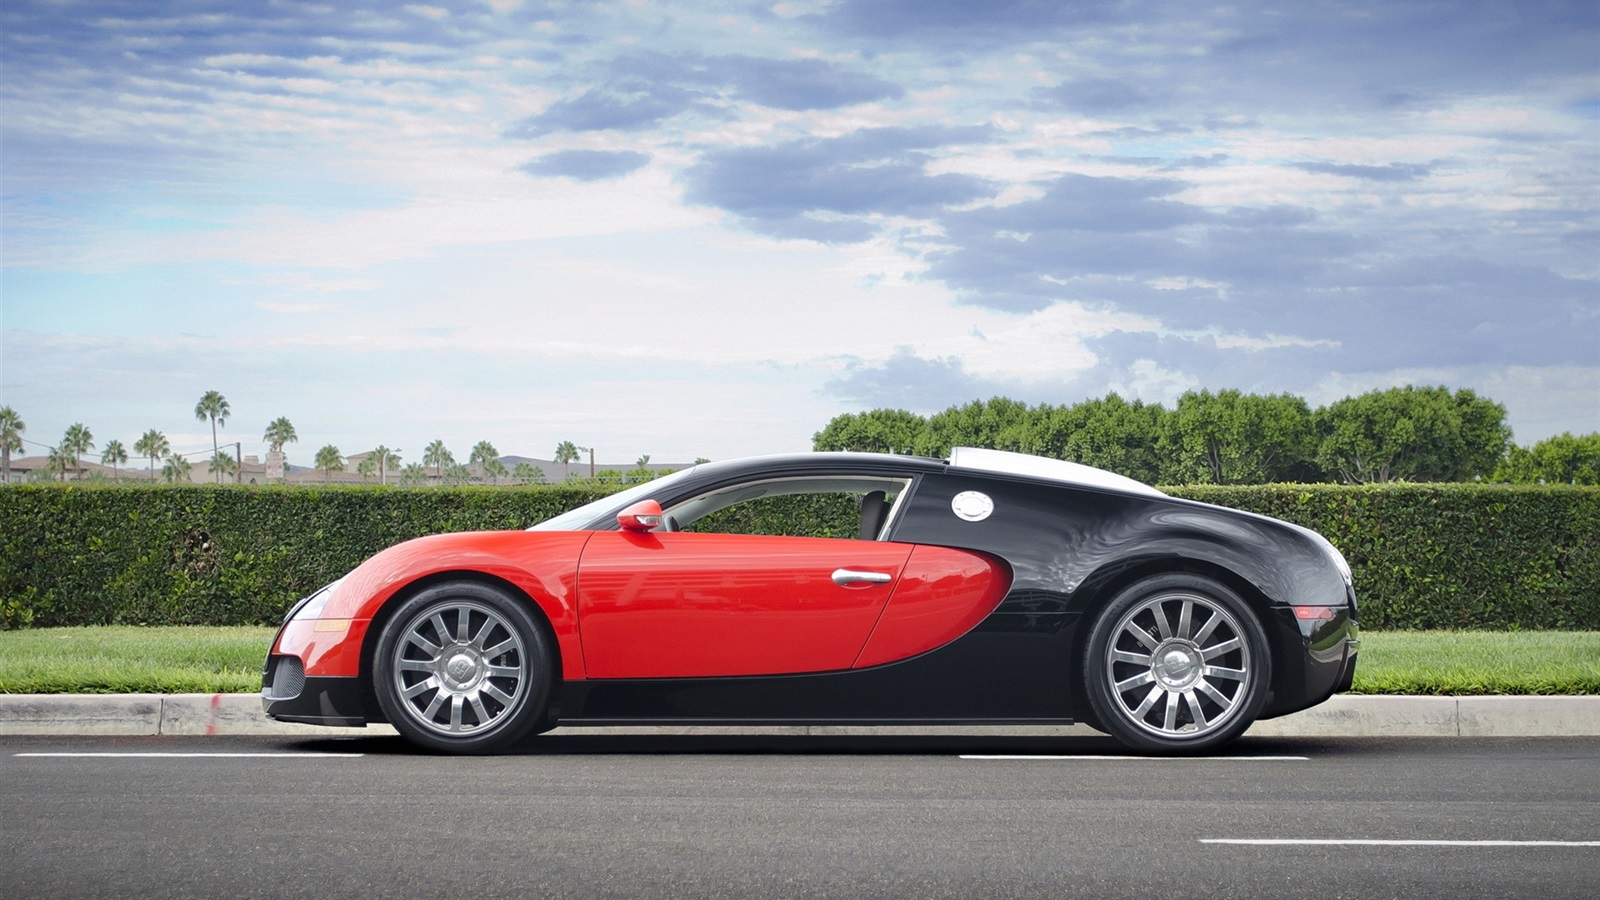 wallpaper bugatti veyron supercar red black 1920x1200 hd